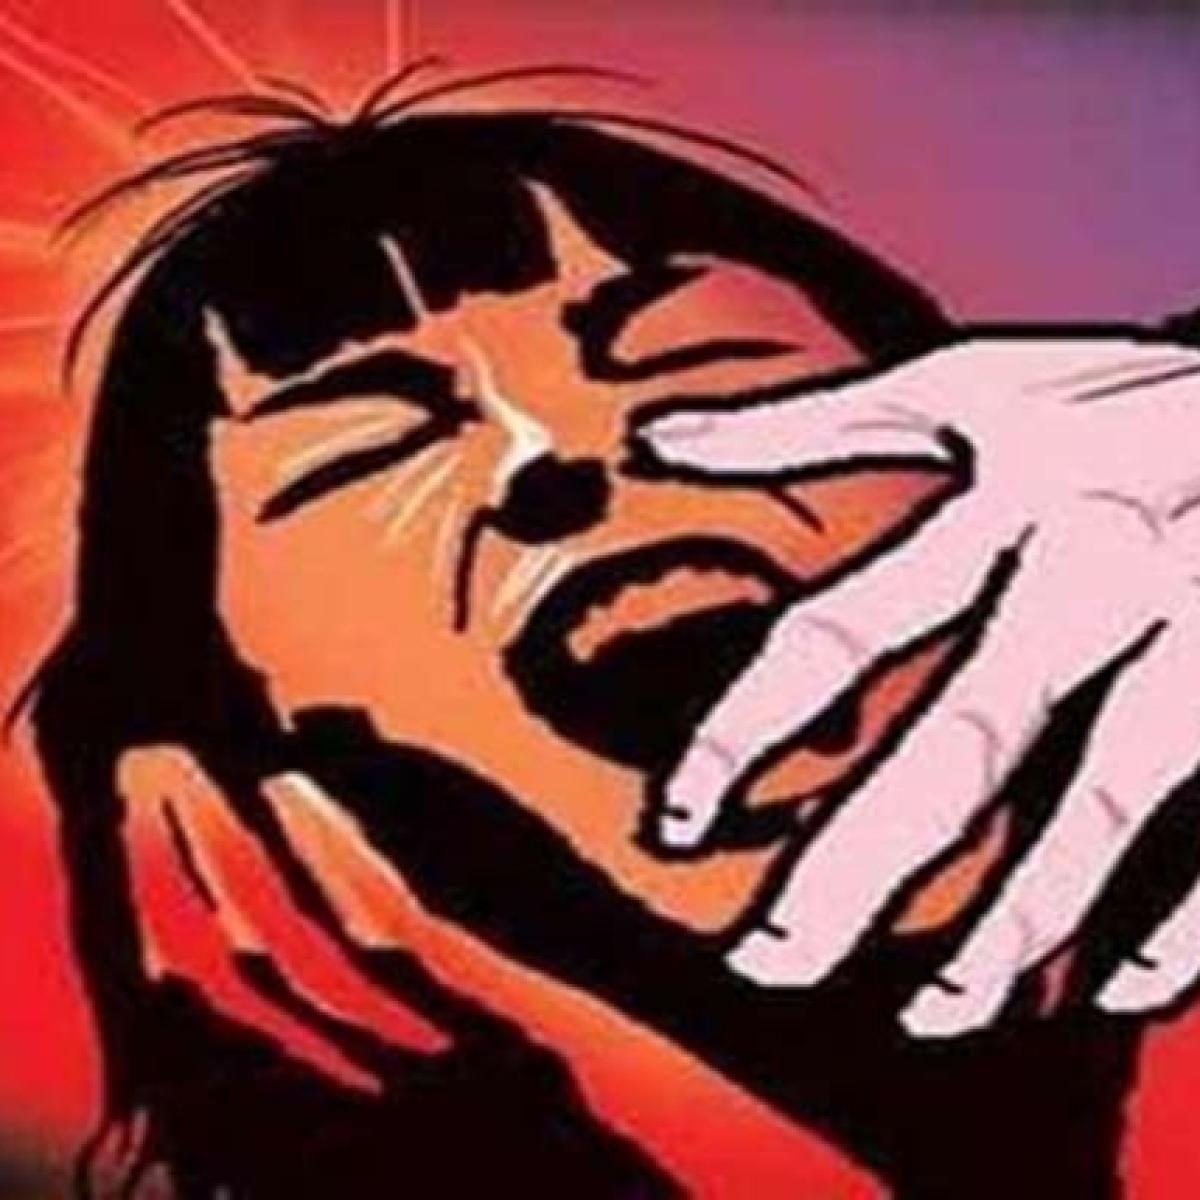 Mumbai Crime: Man held for raping colleague inside Juhu clothing store